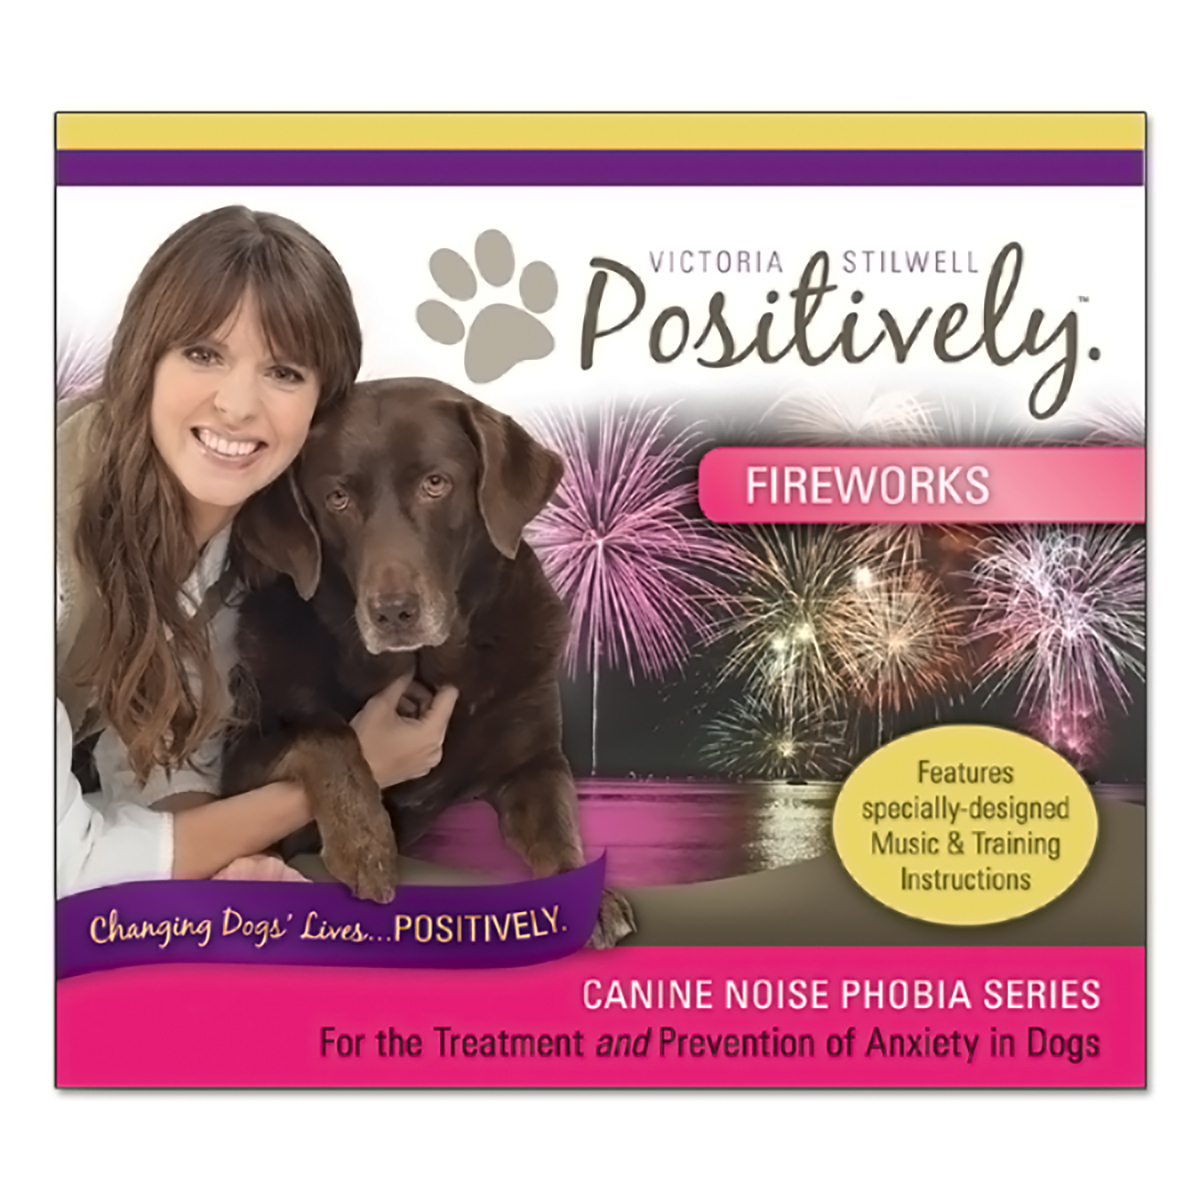 Canine Noise Phobia Series - Fireworks CD